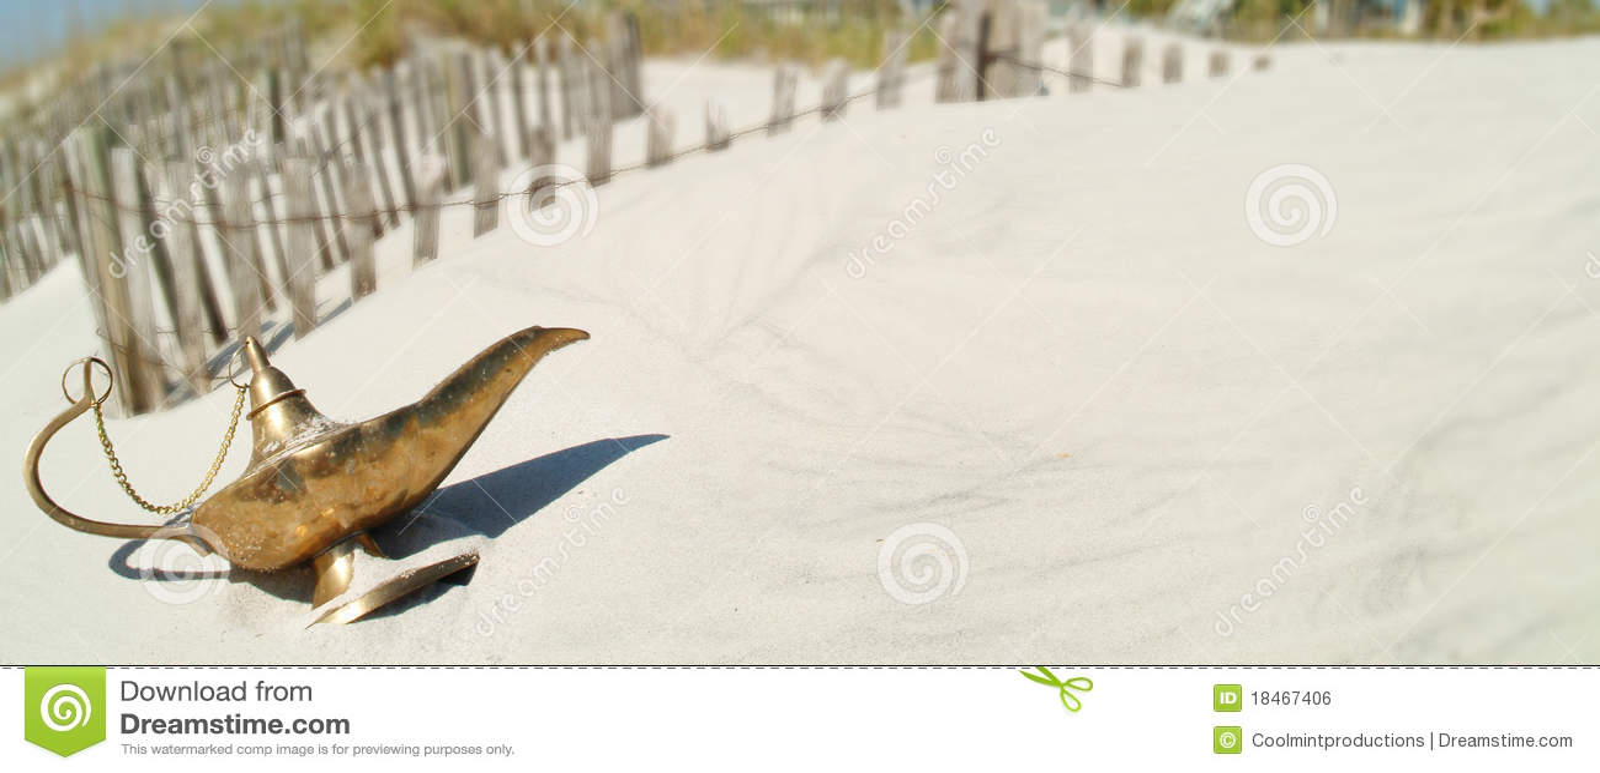 Genie Lamp on beach dune v1